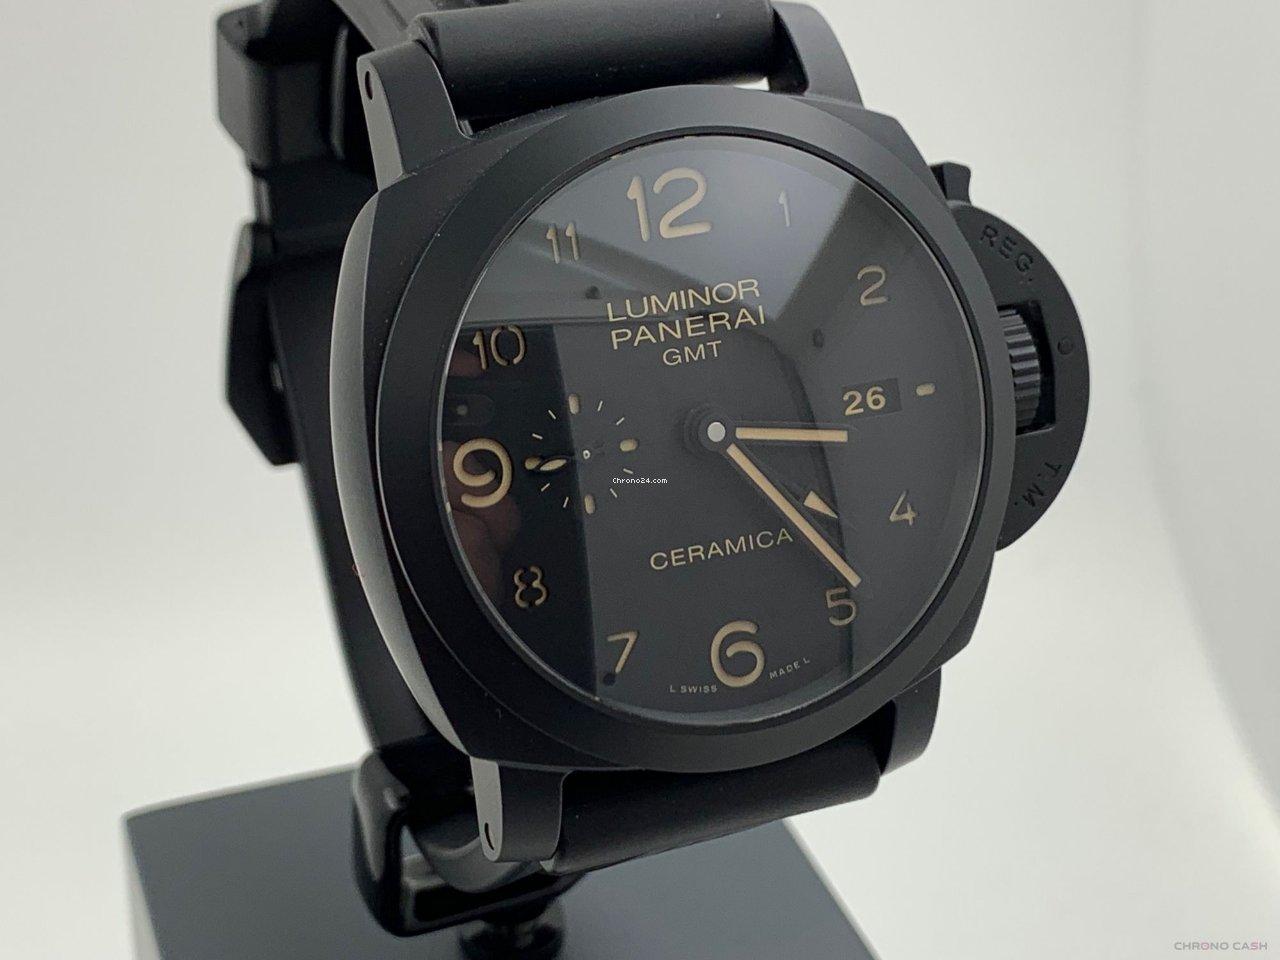 851a2a834c2 Panerai Luminor 1950 Cerâmica - Todos os preços de relógios Panerai Luminor  1950 Cerâmica na Chrono24